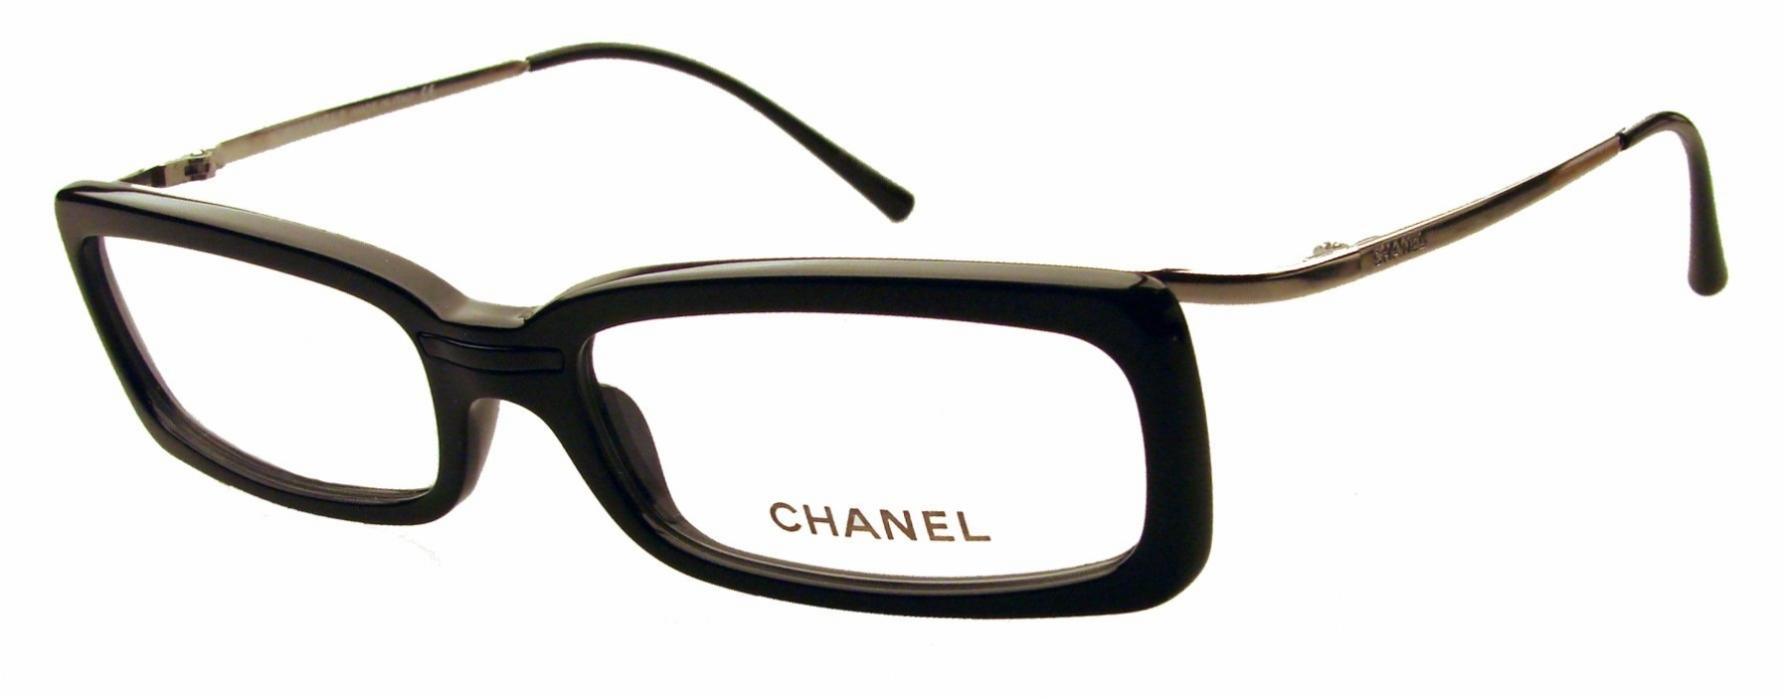 Cheap designer sunglasses chanel for Decor my eyes